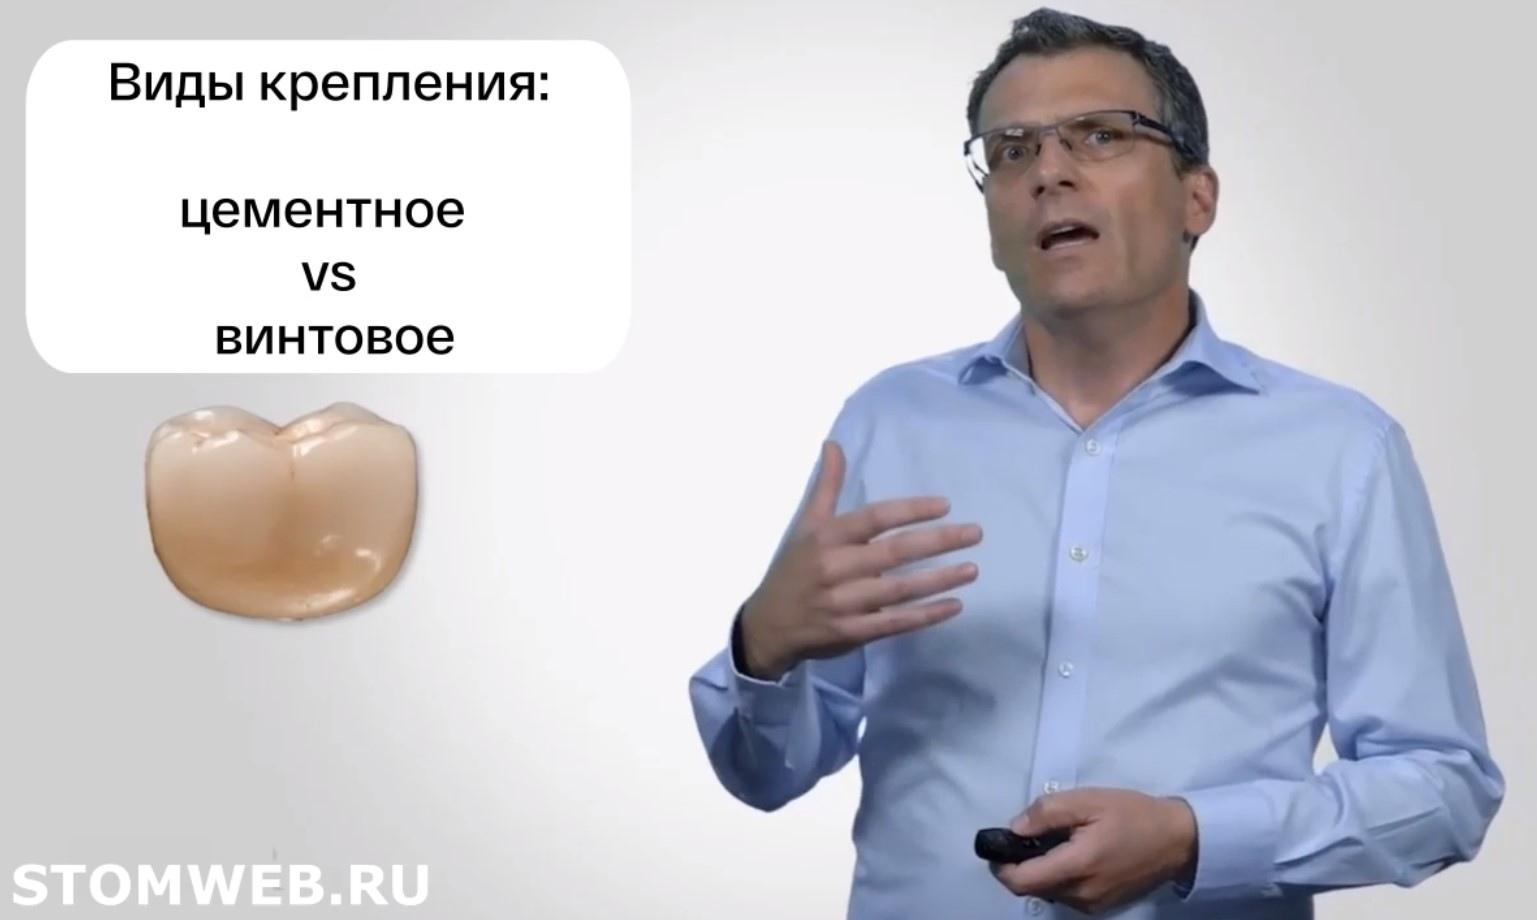 vybor-abatmentov